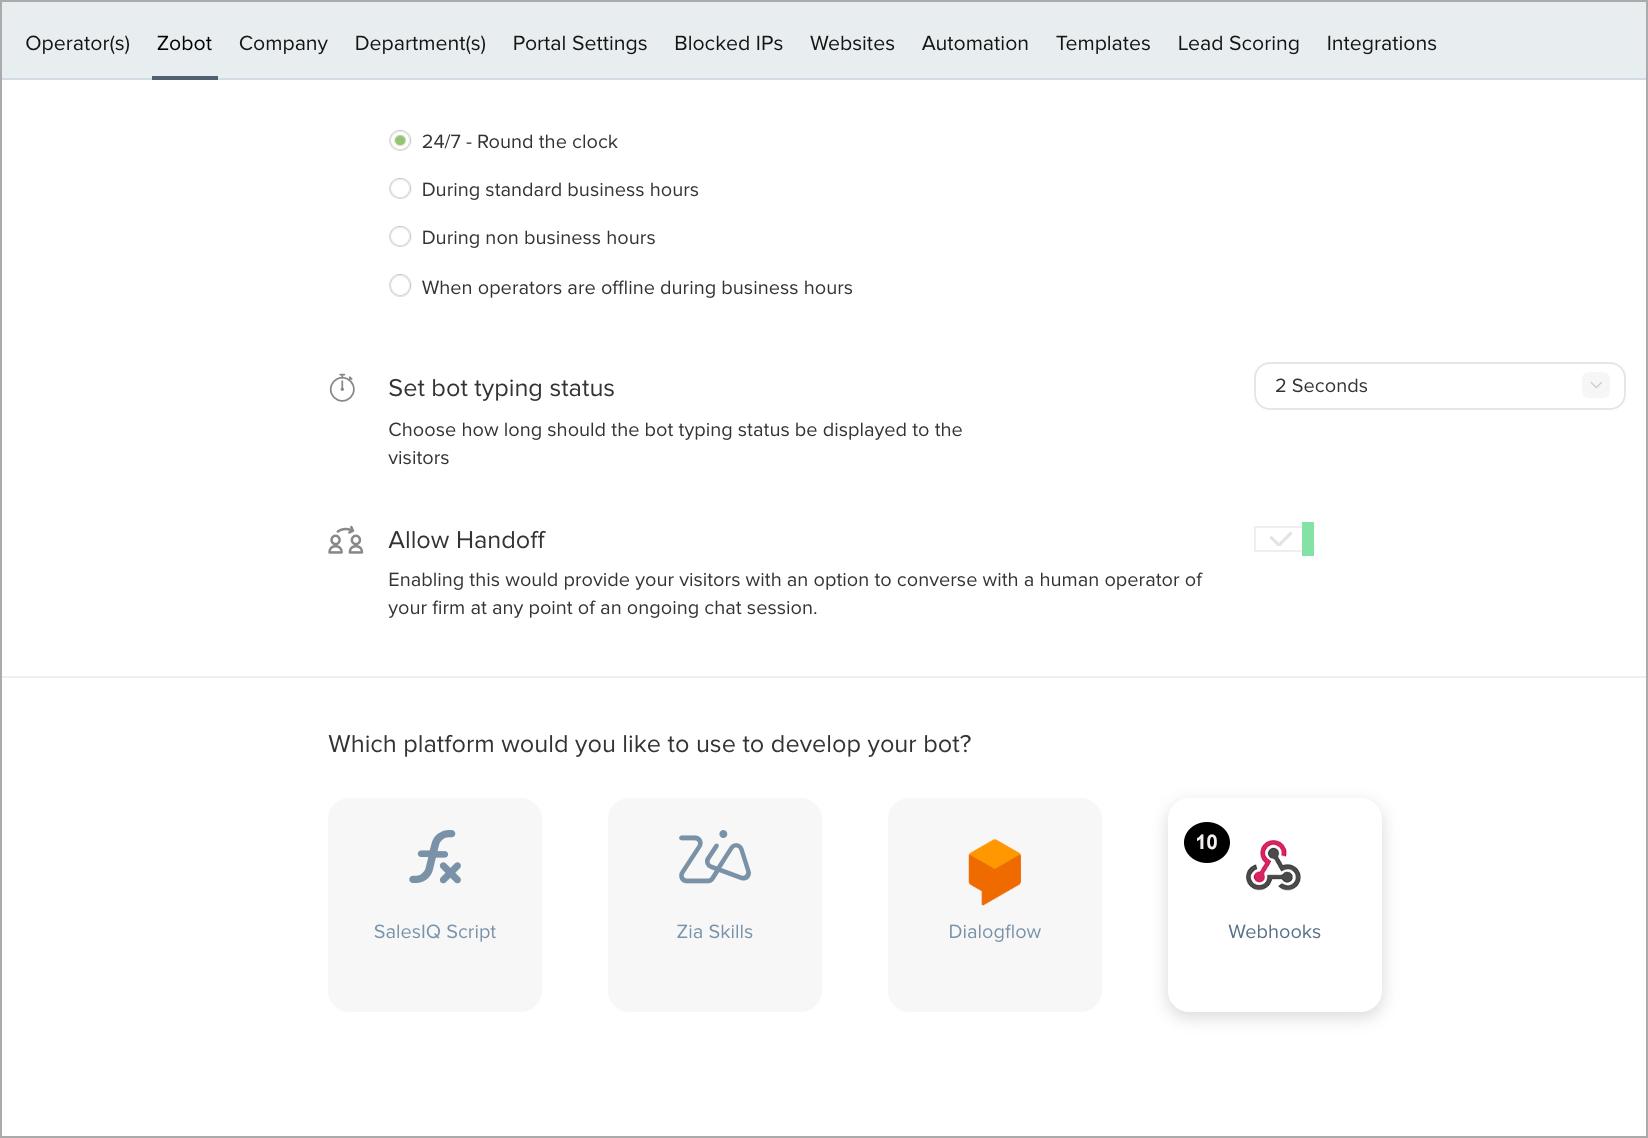 Integrating Zobot via Web hooks